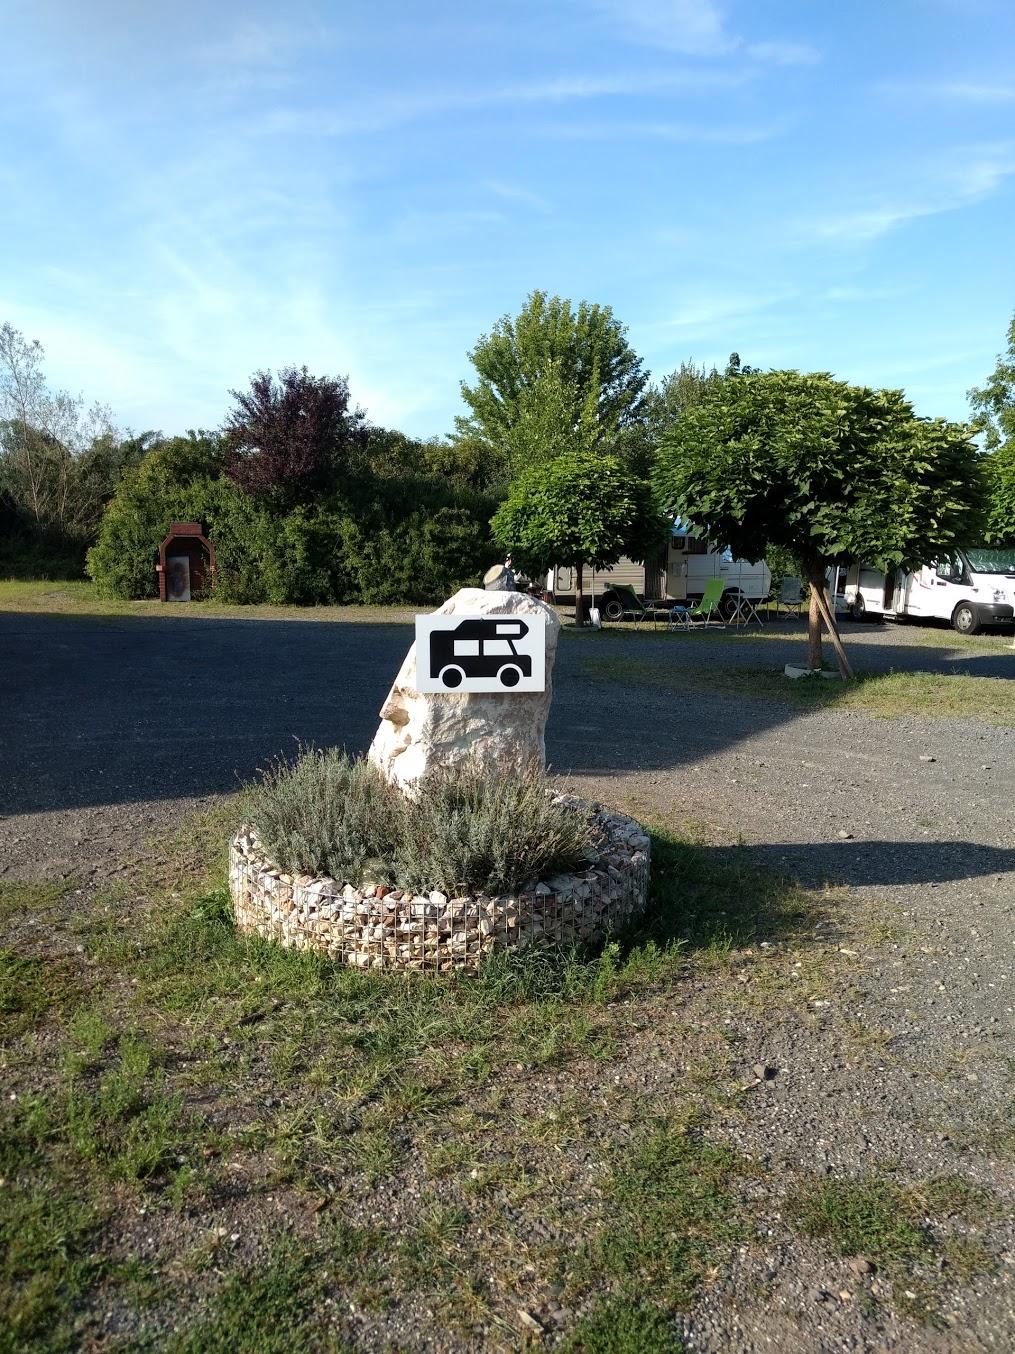 Sixt Campingstellplatz Mureck Paradise